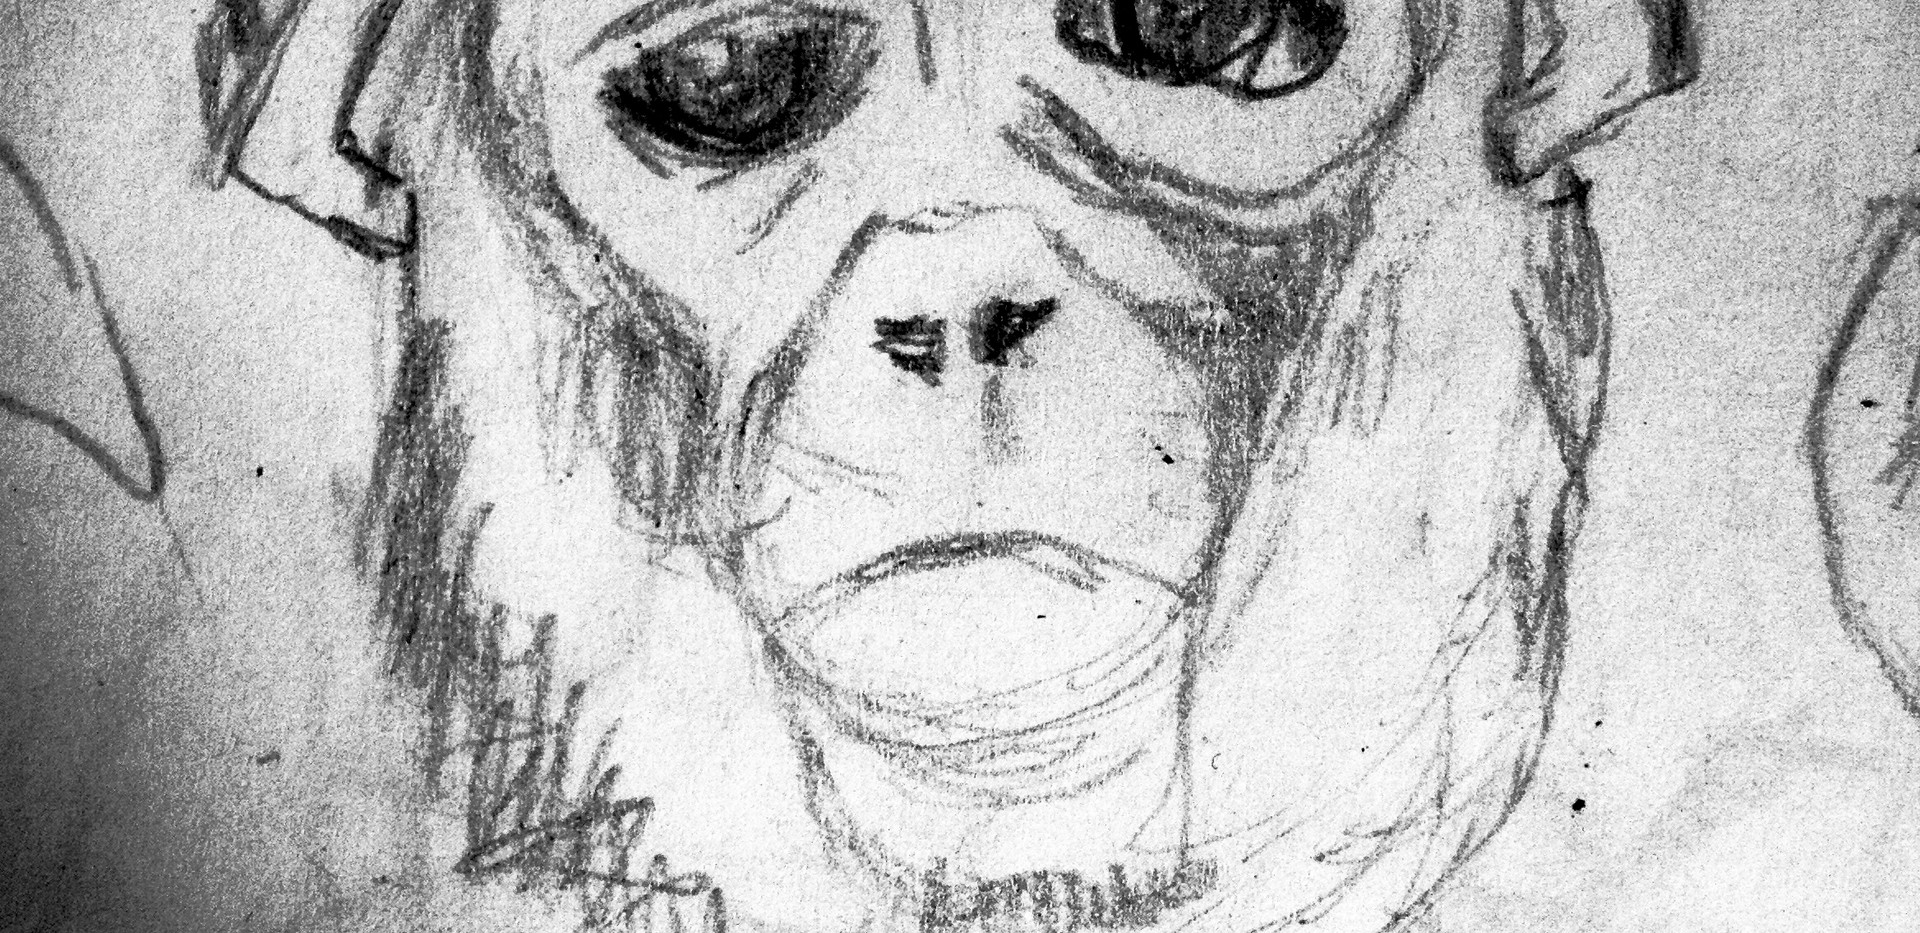 Monkeys Sketch9.jpg